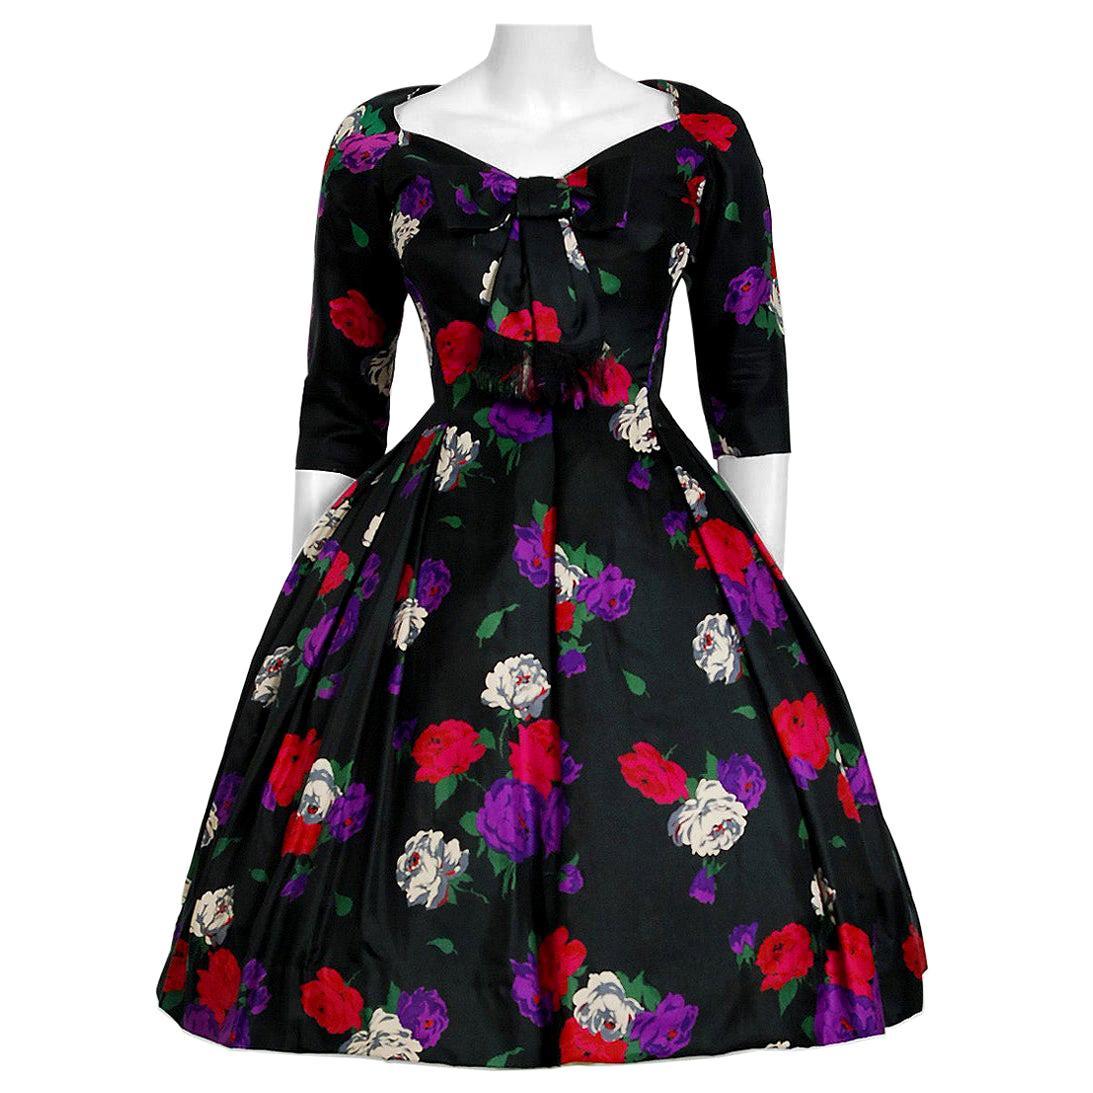 Vintage 1950's Suzy Perette Rose-Garden Floral Print Silk Bow Plunge Full Dress